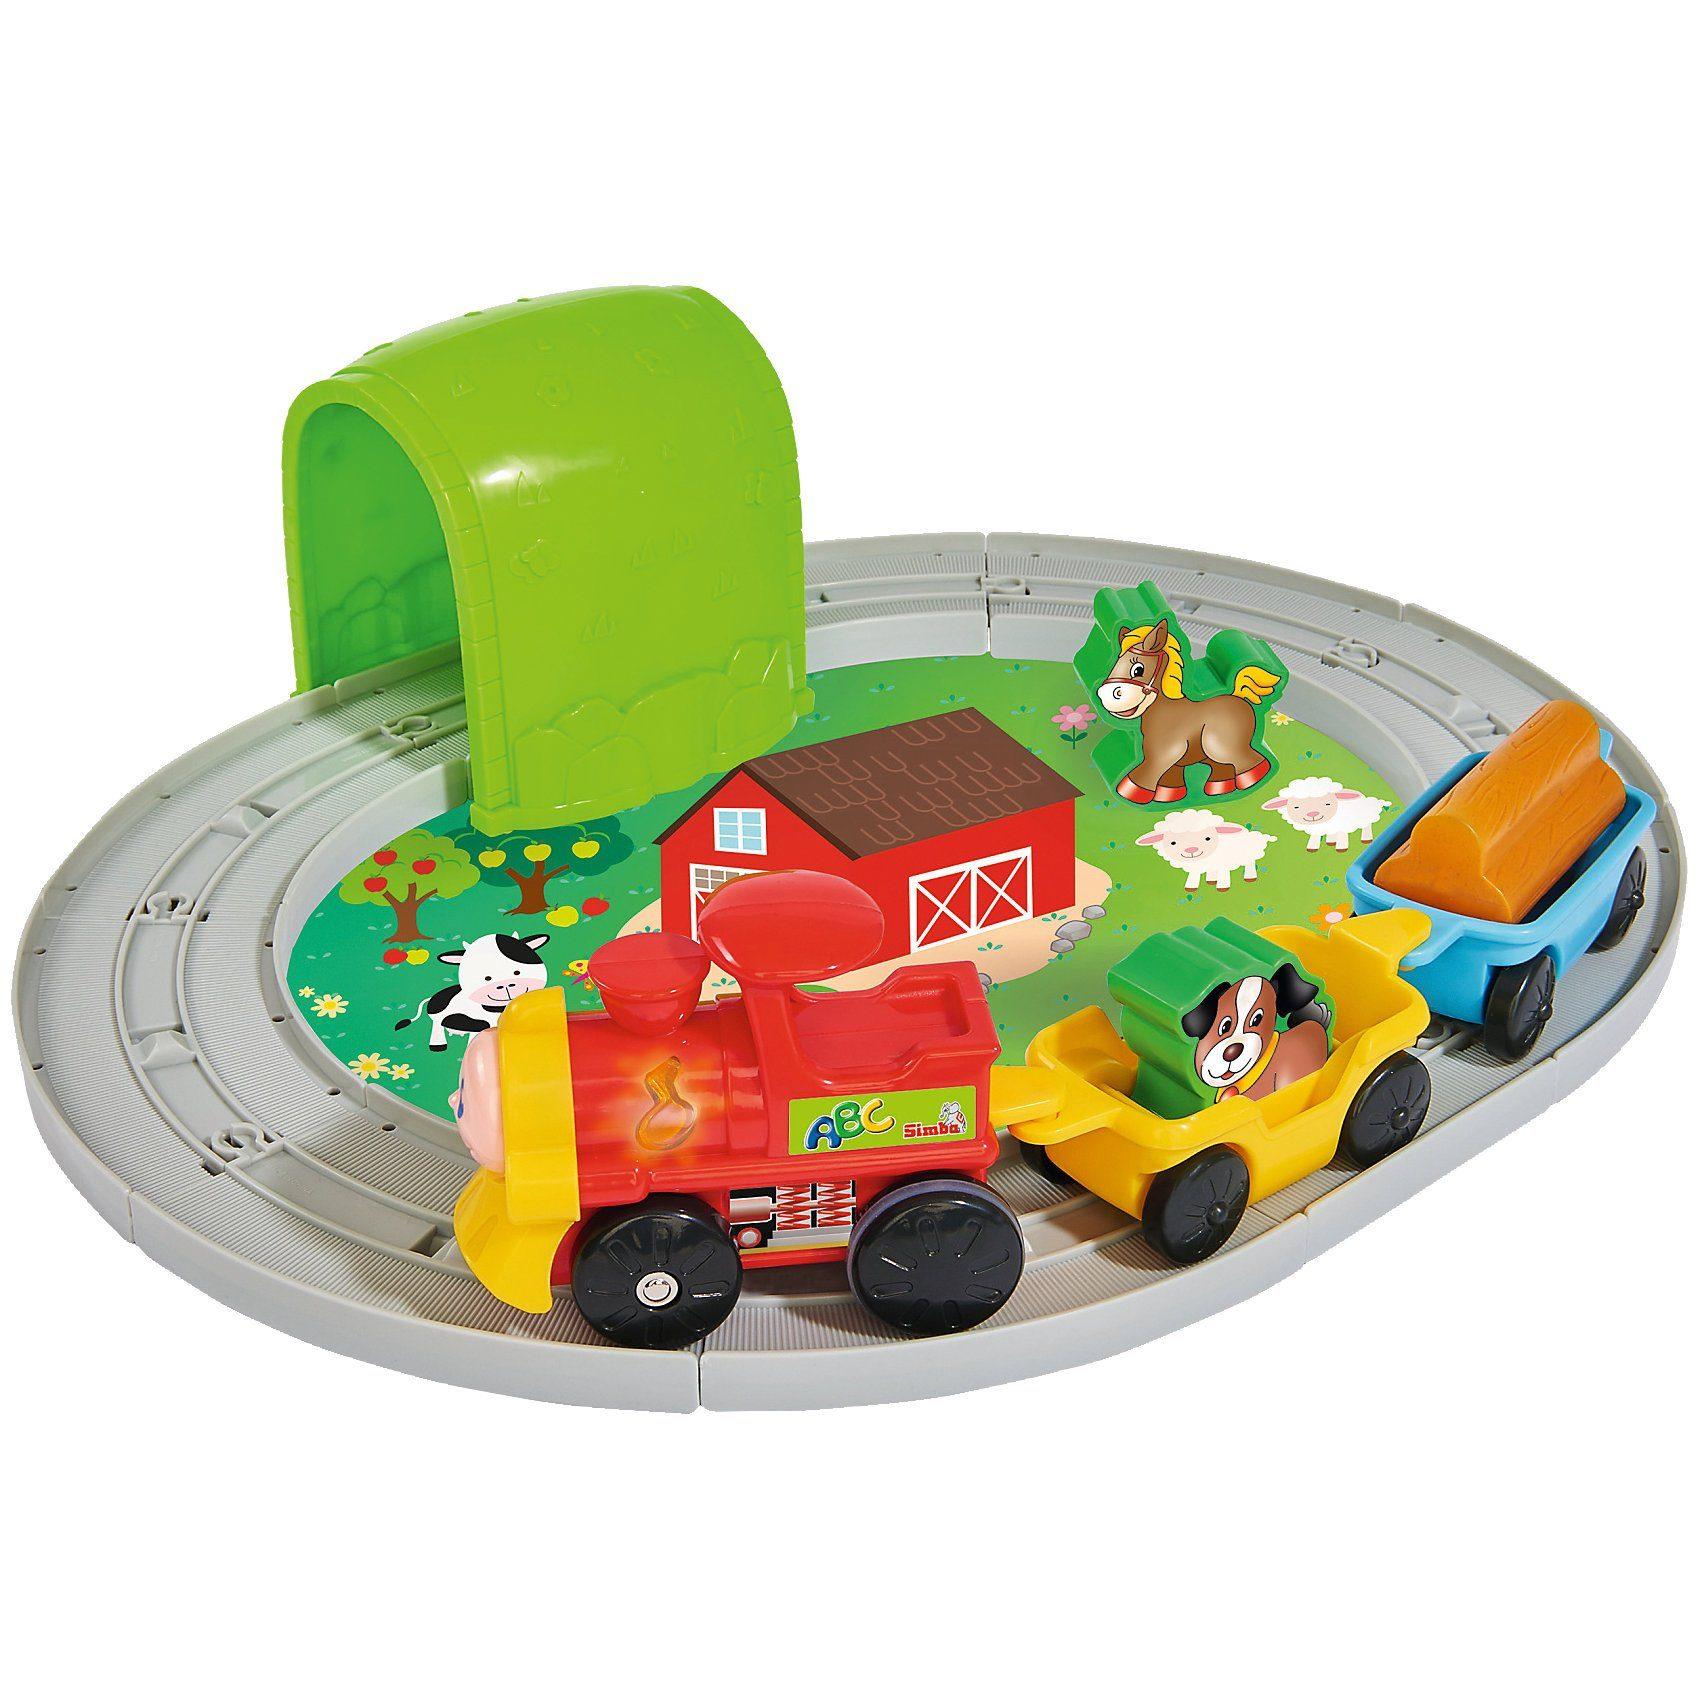 Simba ABC Tiereisenbahn Set, 18-tlg.